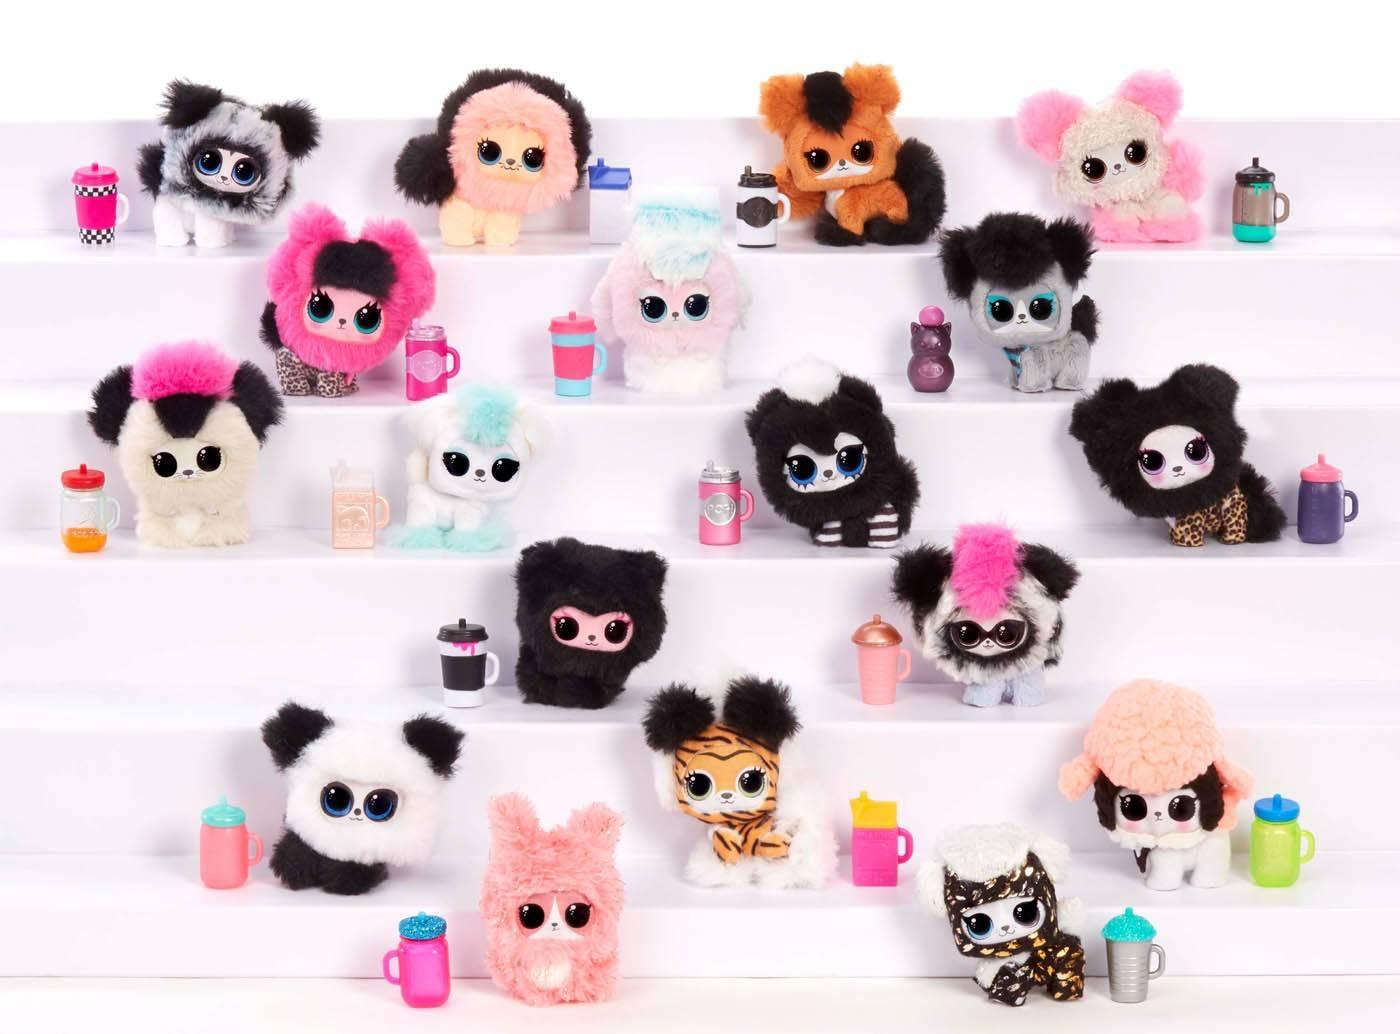 LOL fluffy pets cała kolekcja